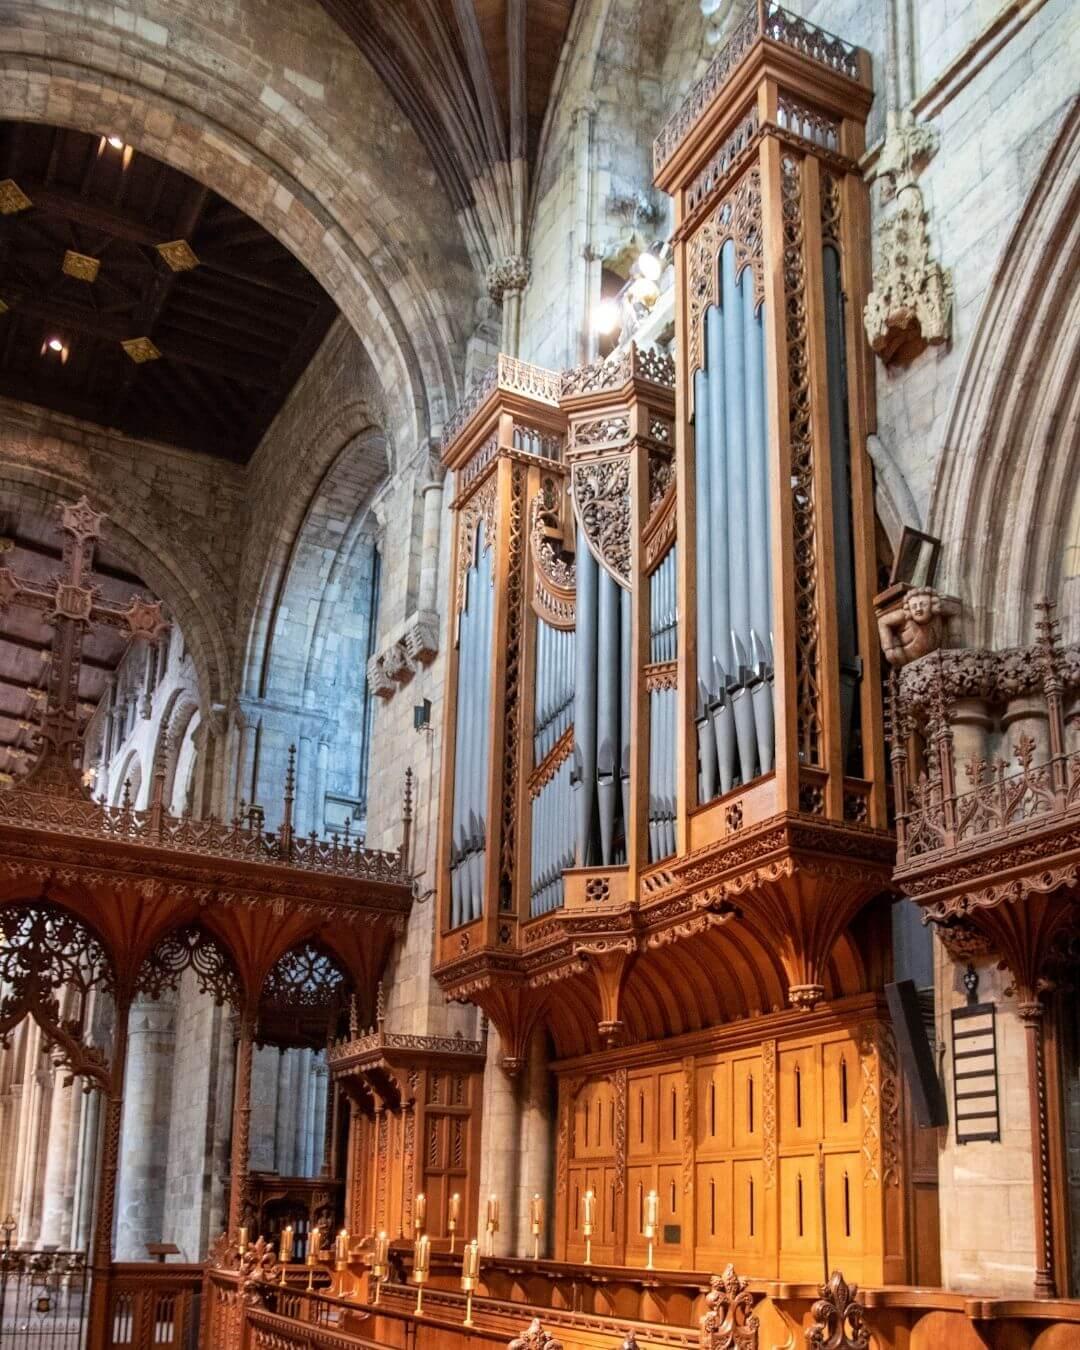 The Hill Organ